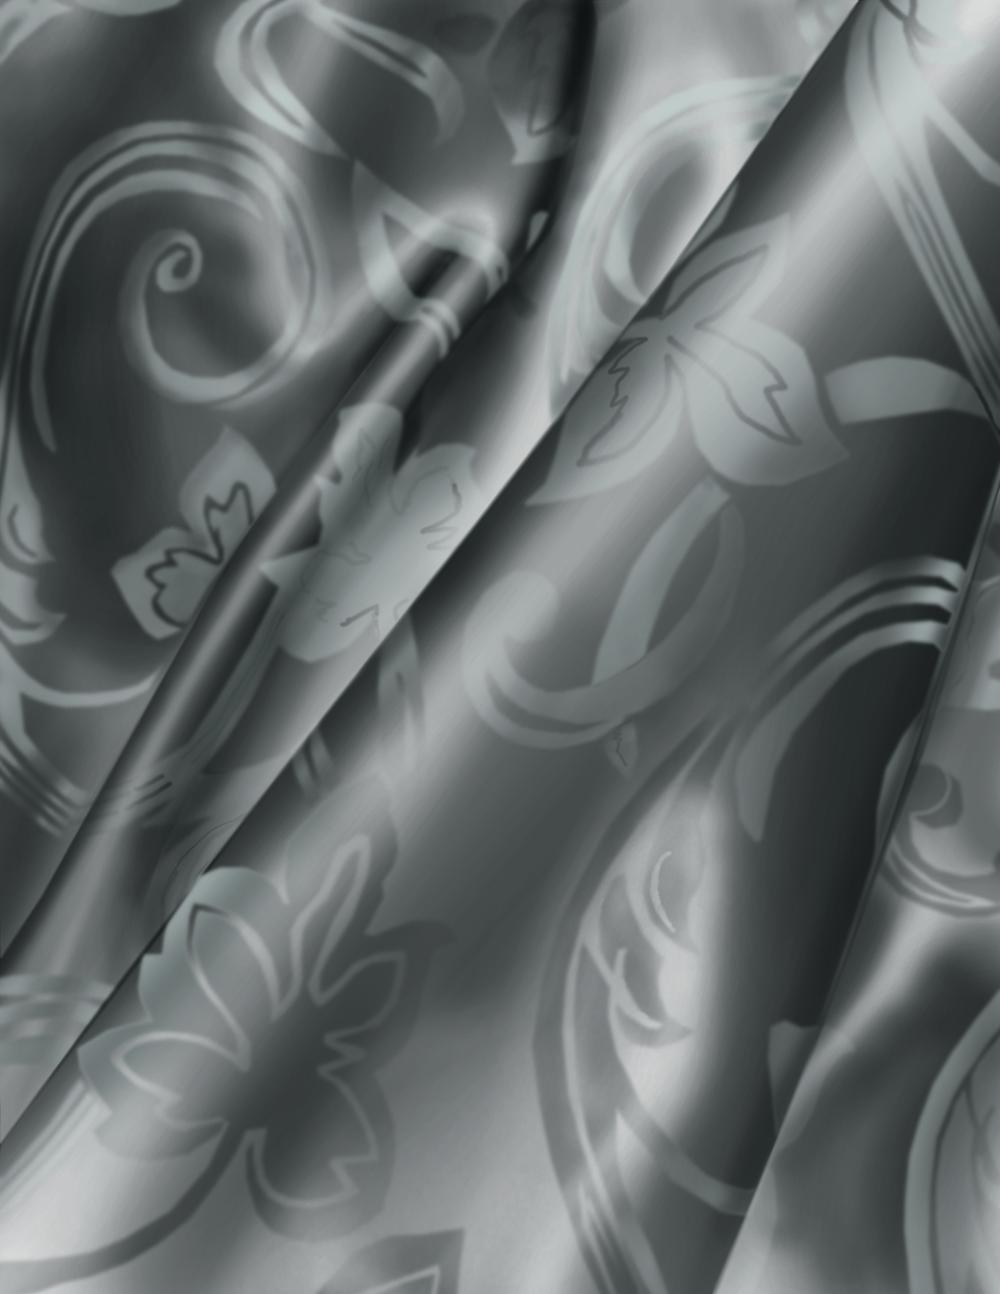 ART140 Digital Photography - Digital Illustration: Matt Myers